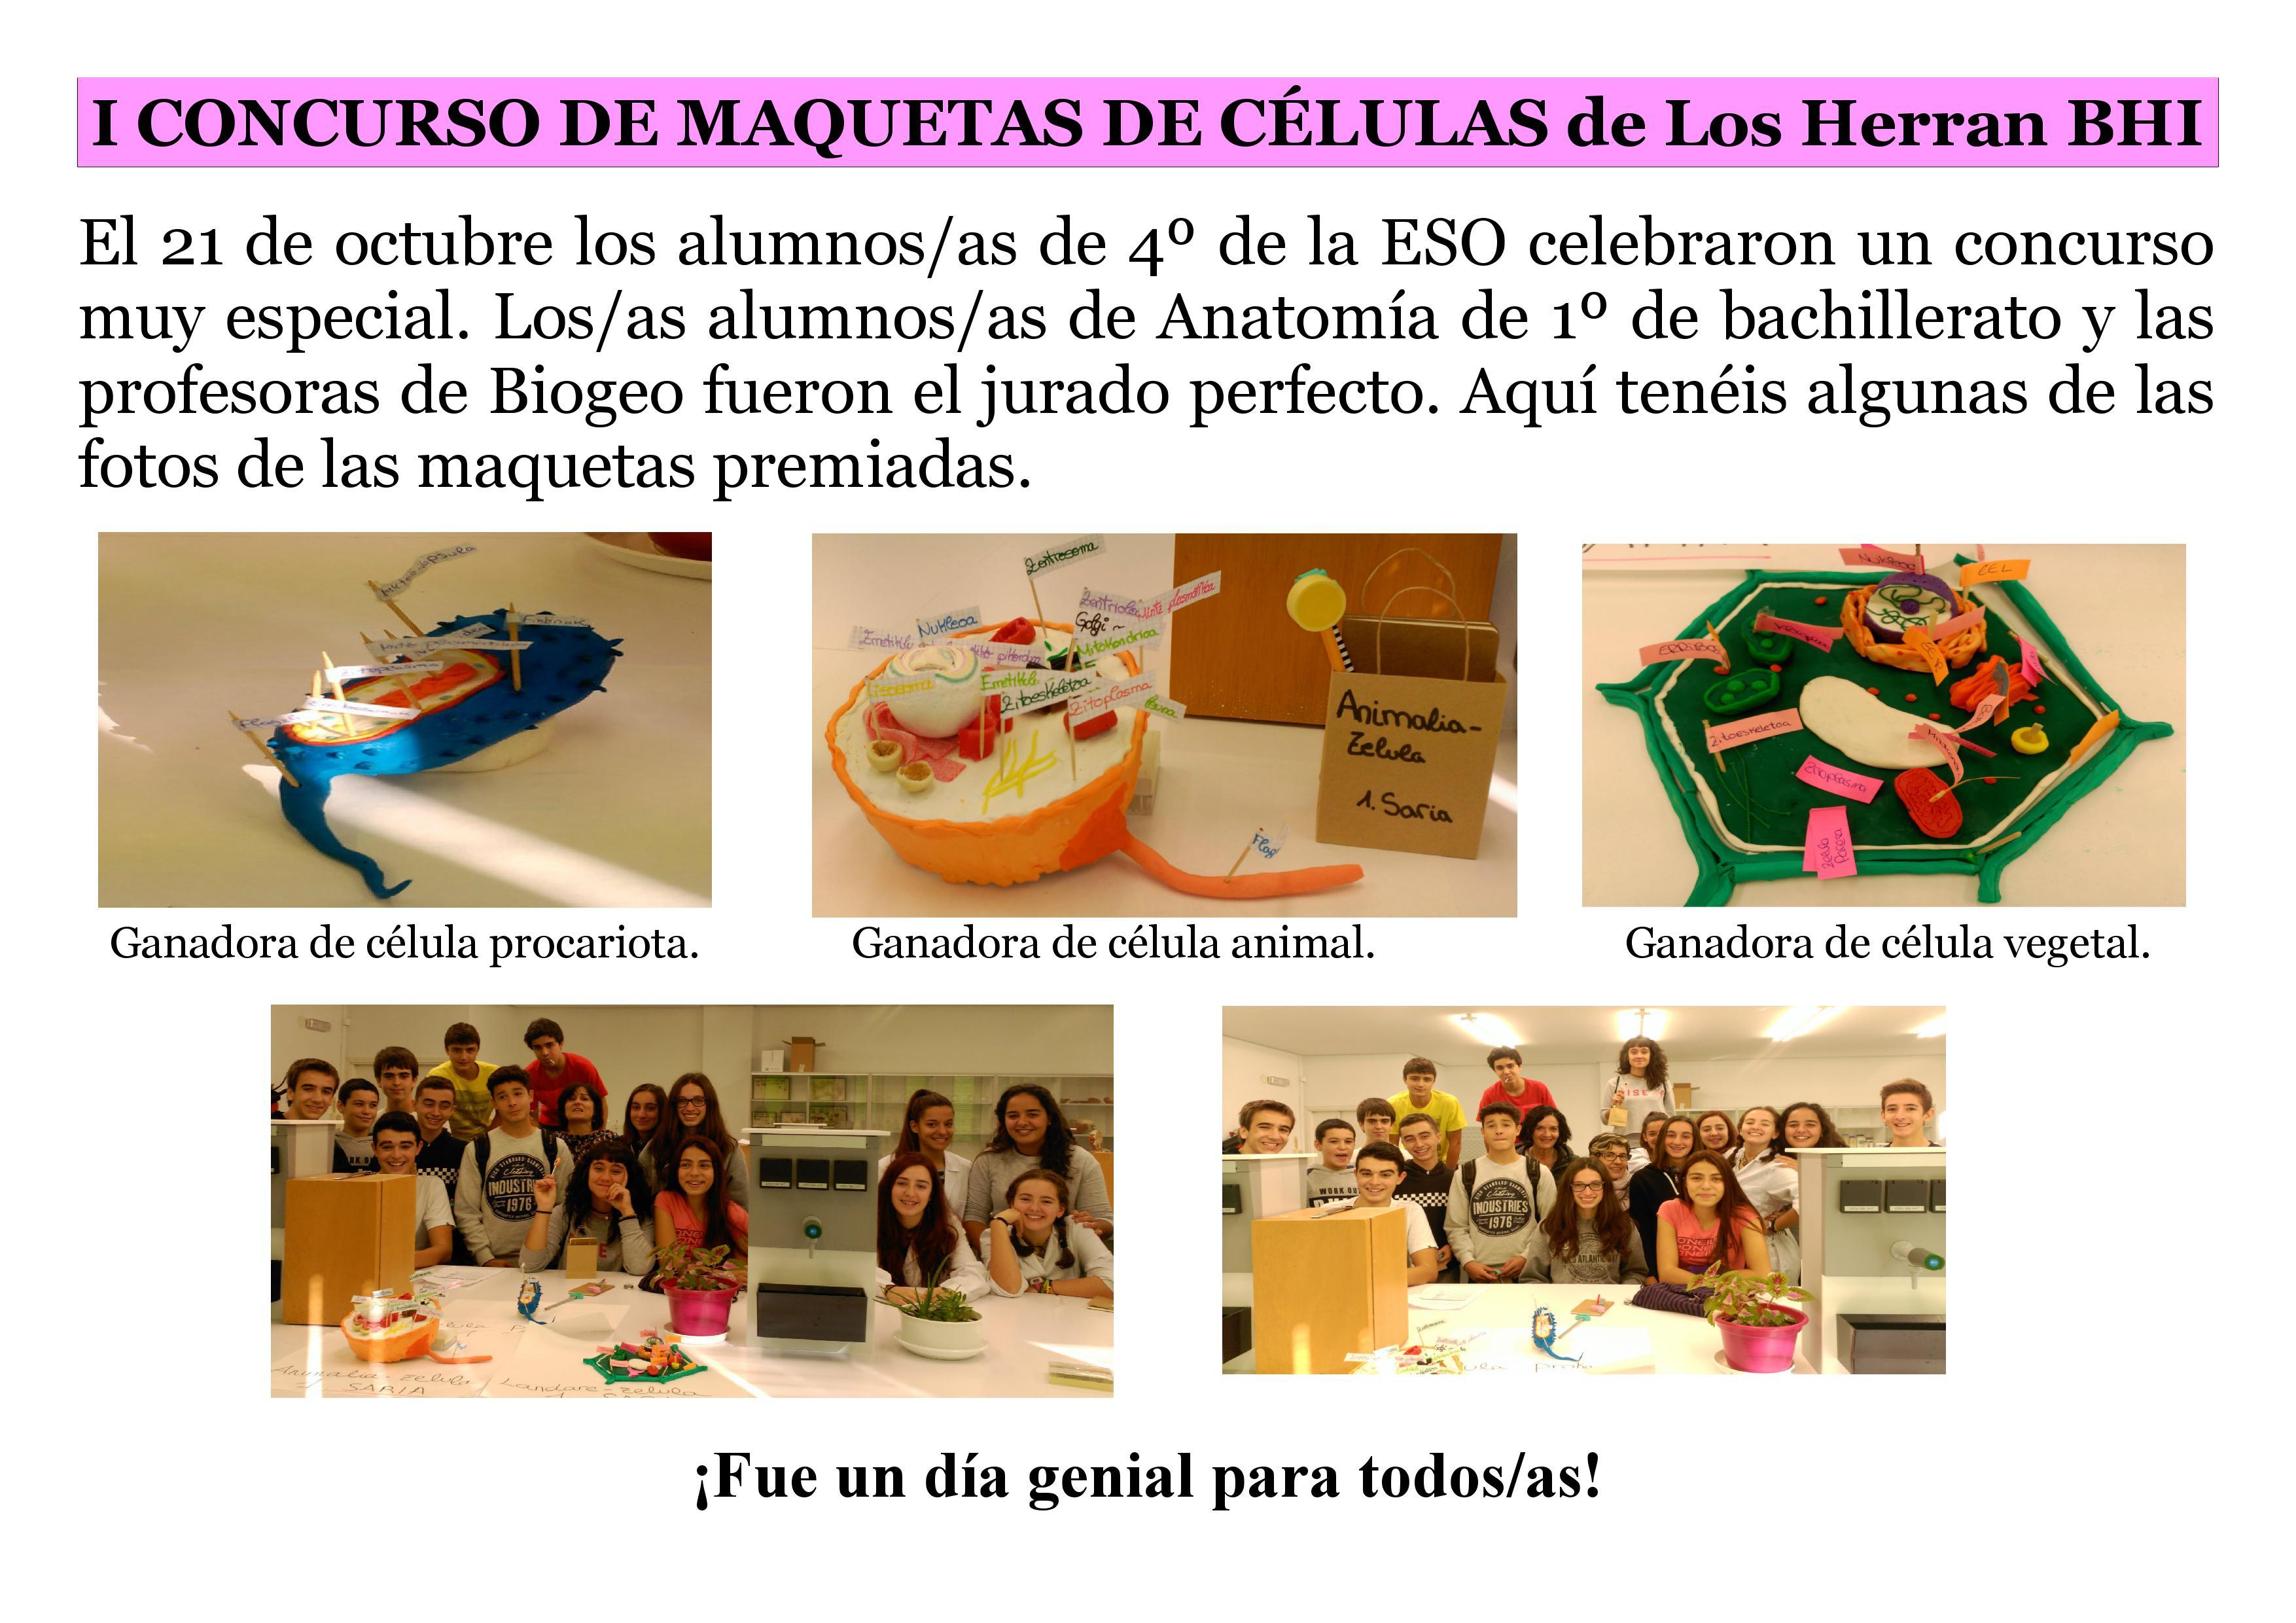 I. Concurso de Maquetas de Células - I.E.S. Los Herrán B.H.I.